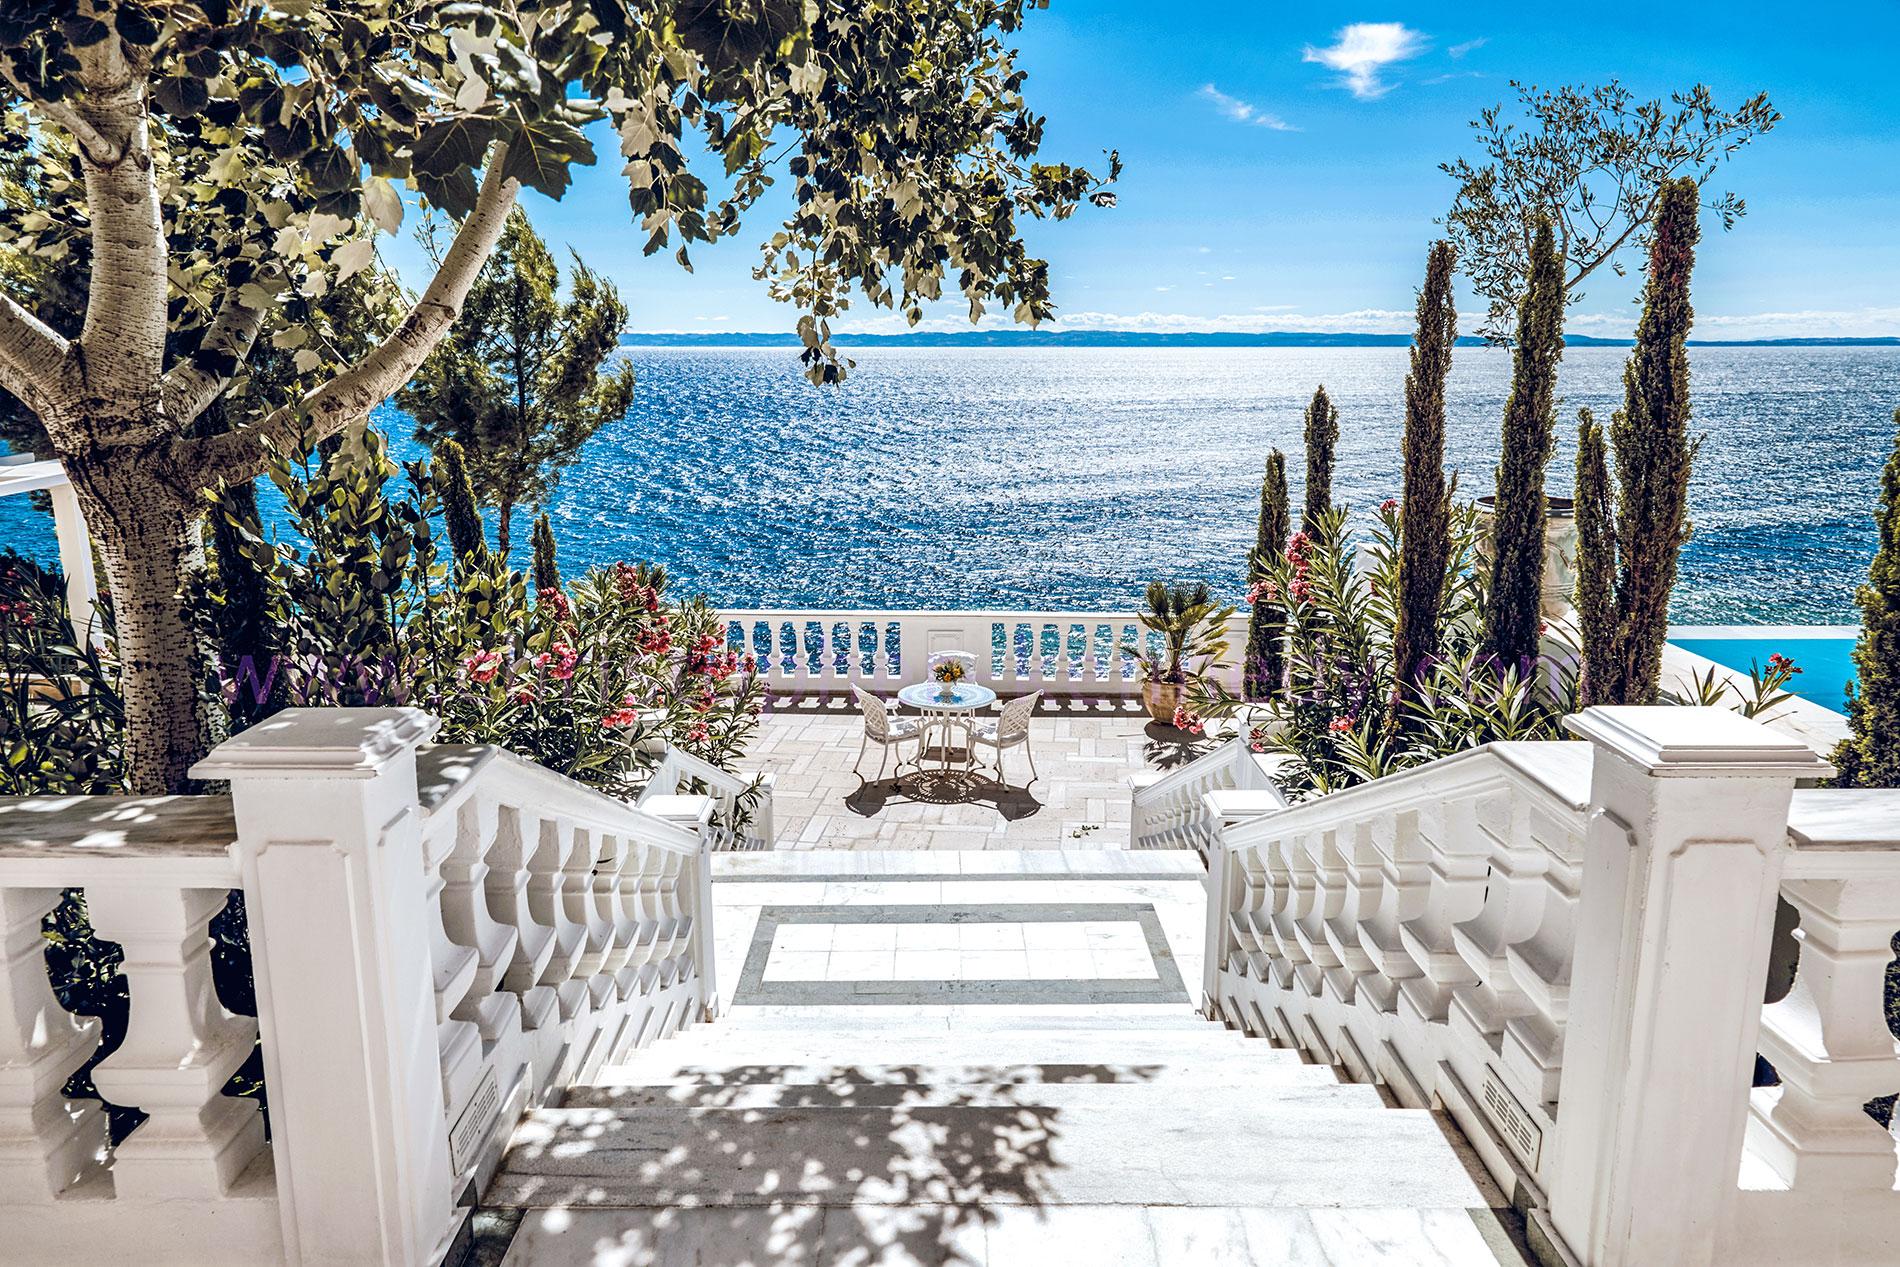 Villa White at Danai Beach Resort Halkidiki